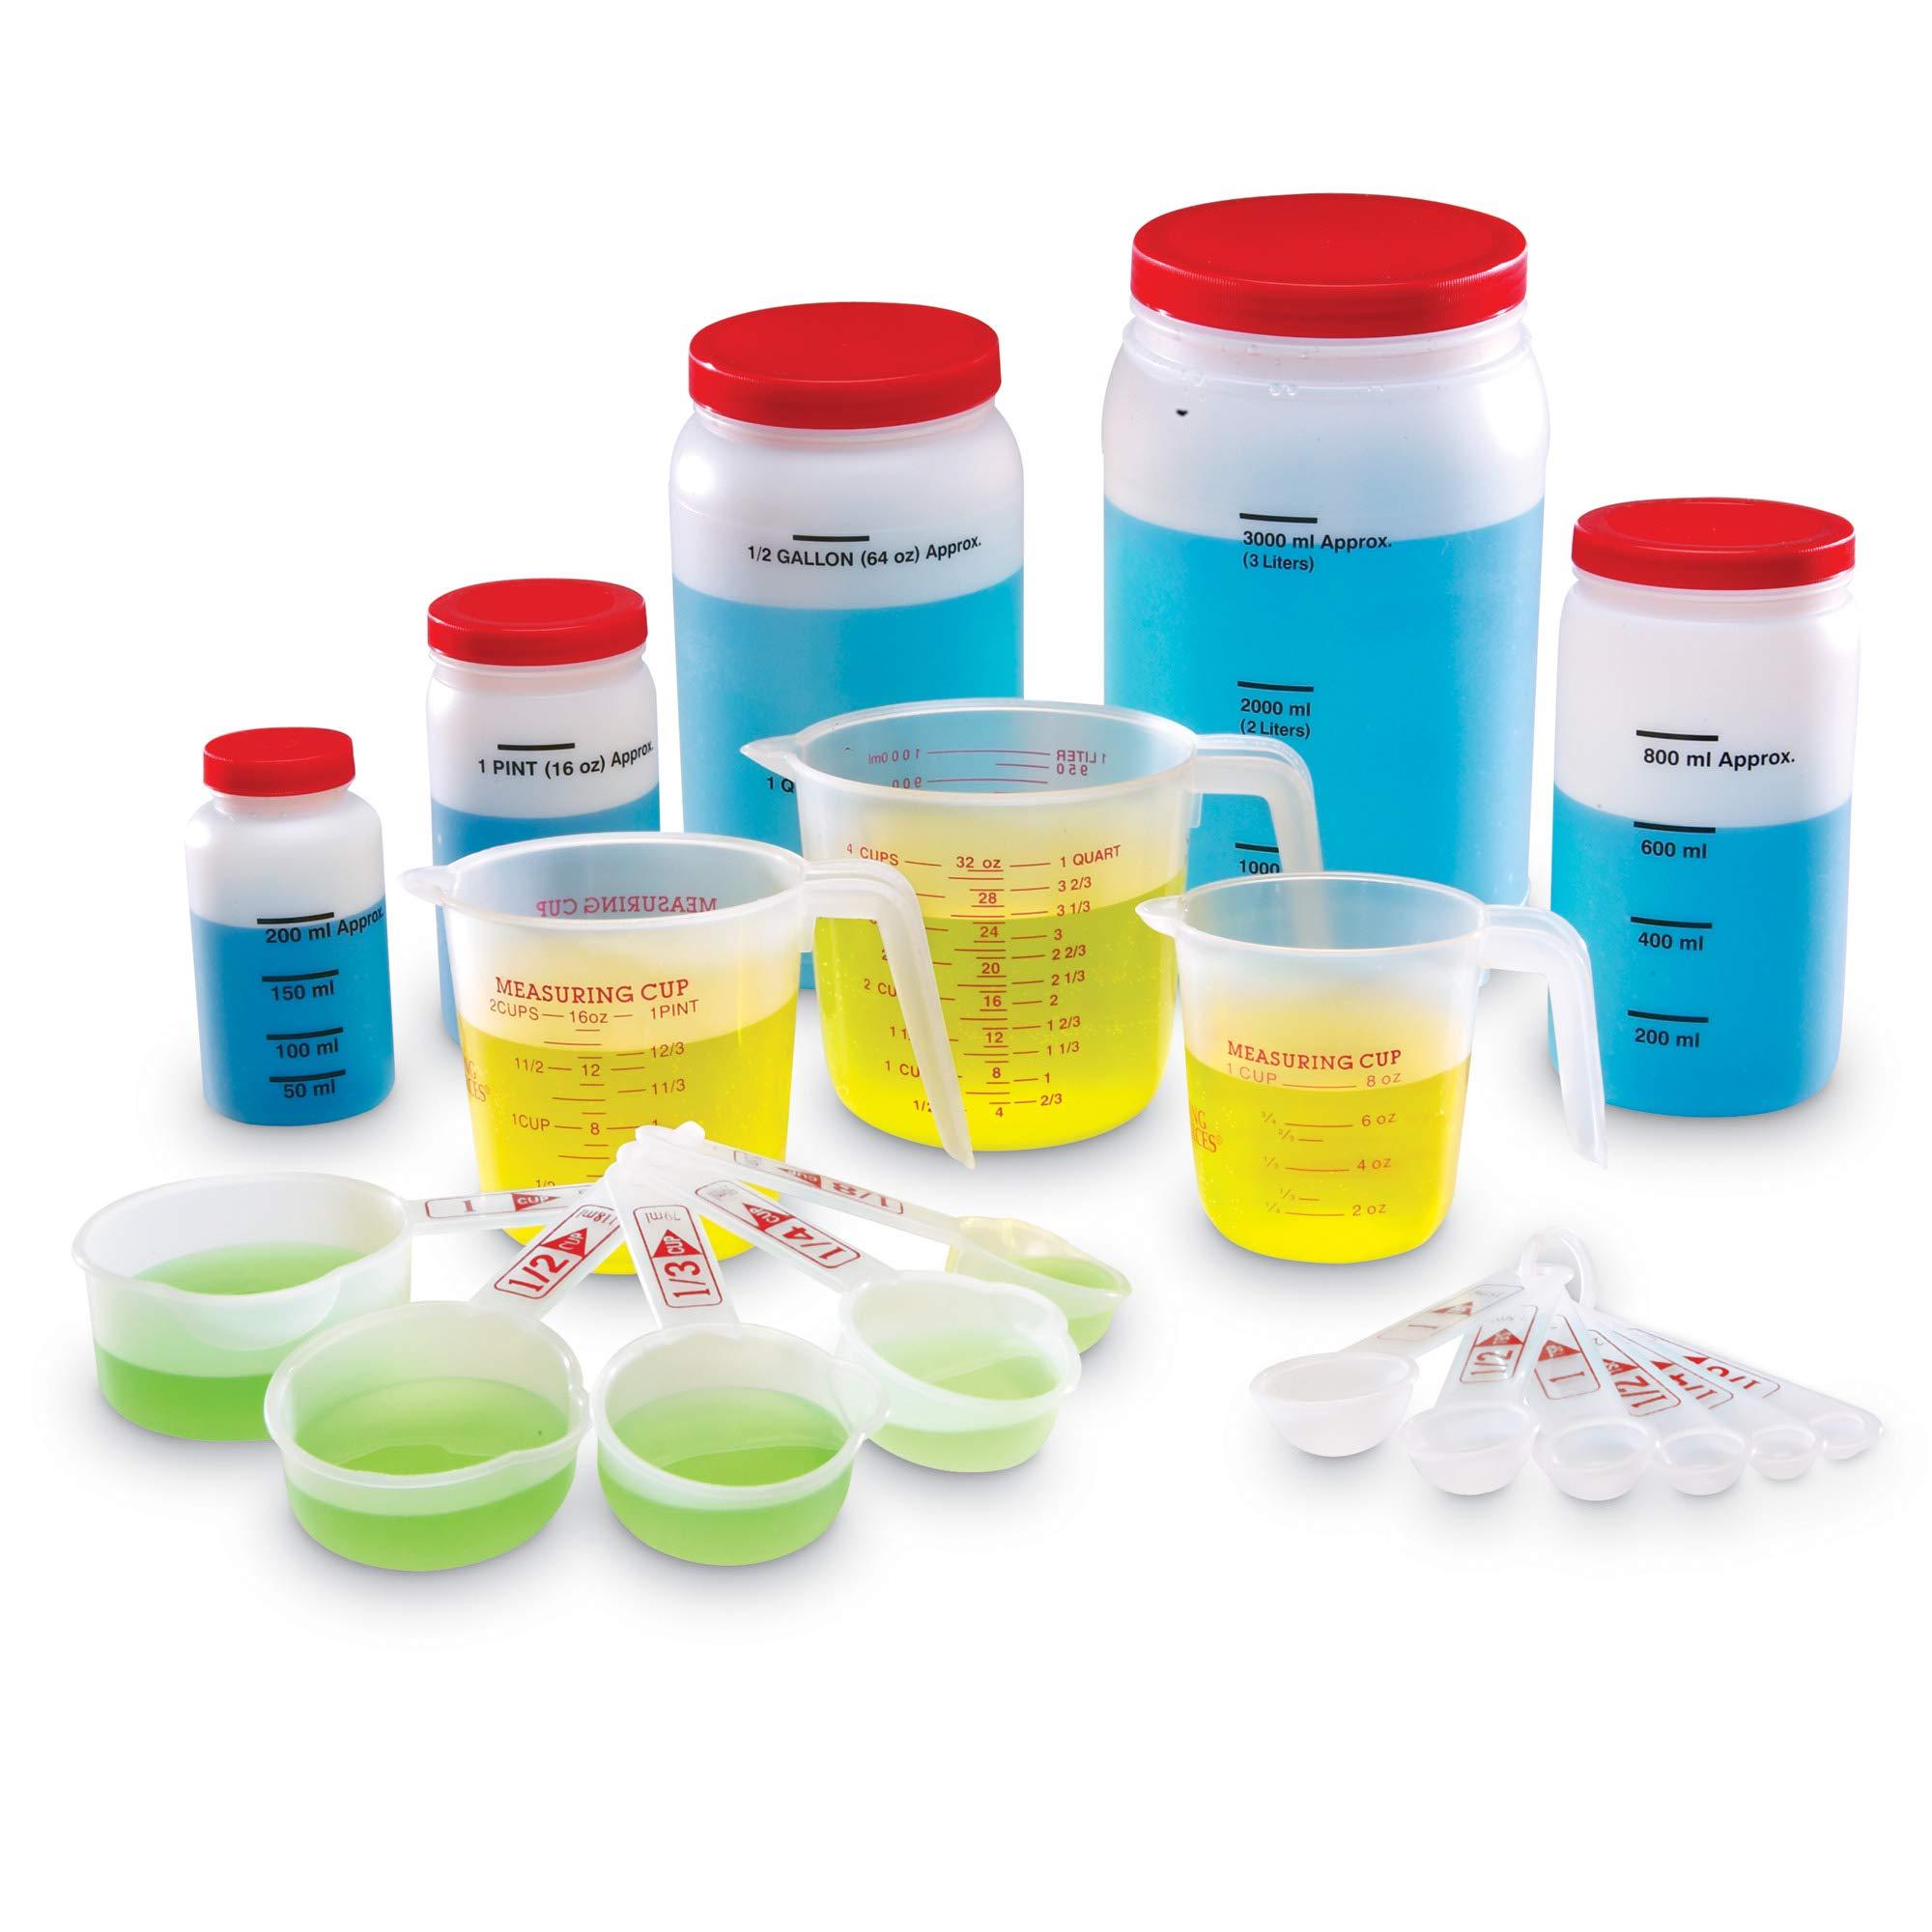 Learning Resources Classroom Liquid Measuring Set, Science Classroom Accessories, Teacher Aids, 19 Piece Set, Grades K+, Ages 5+ (LER0360),Multi-color